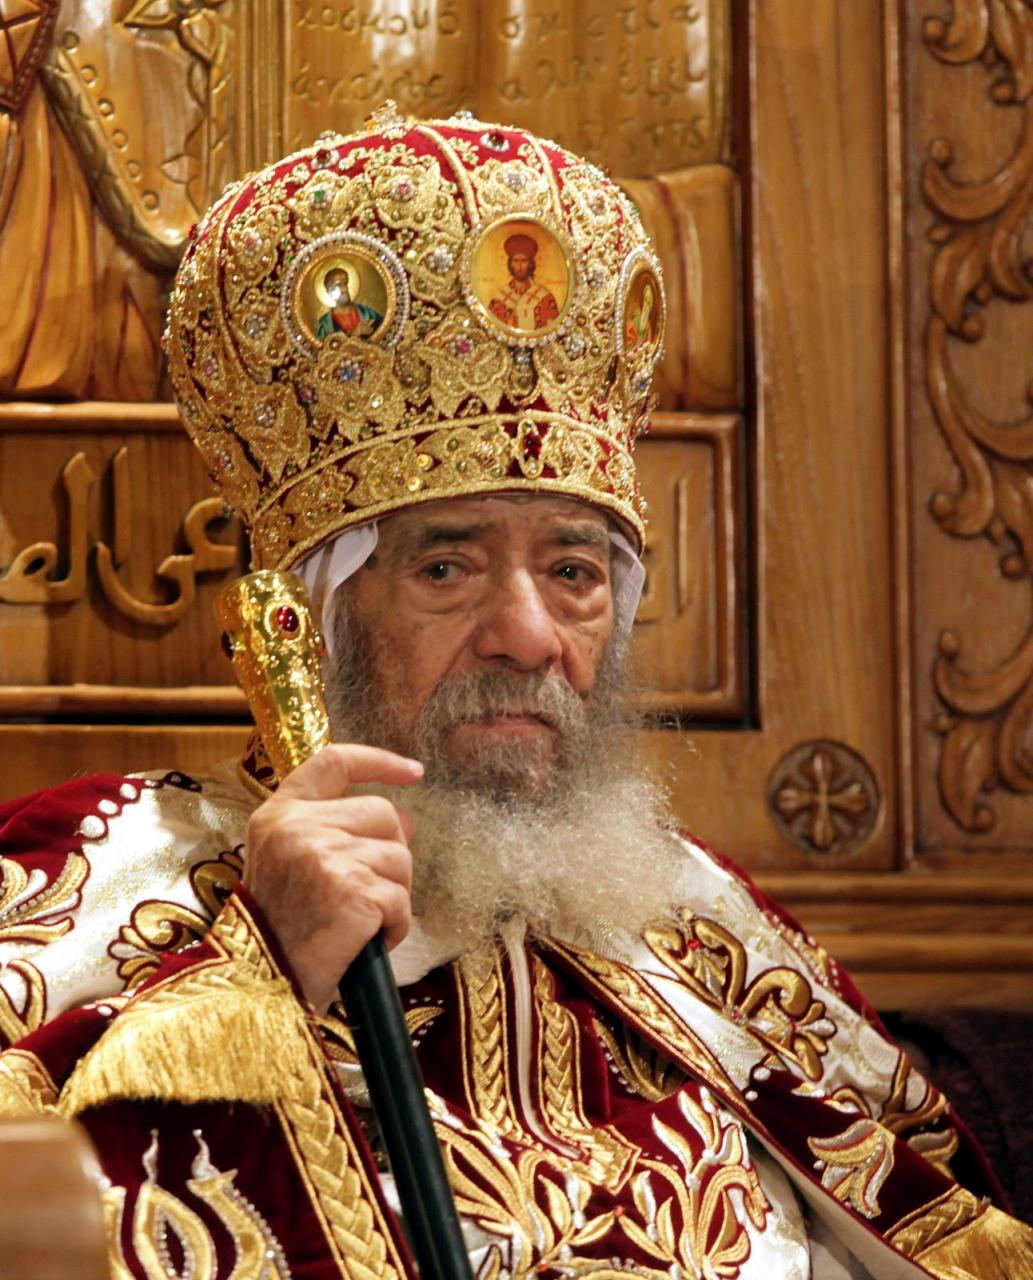 بالصور تحميل صورة البابا شنودة 20160719 814